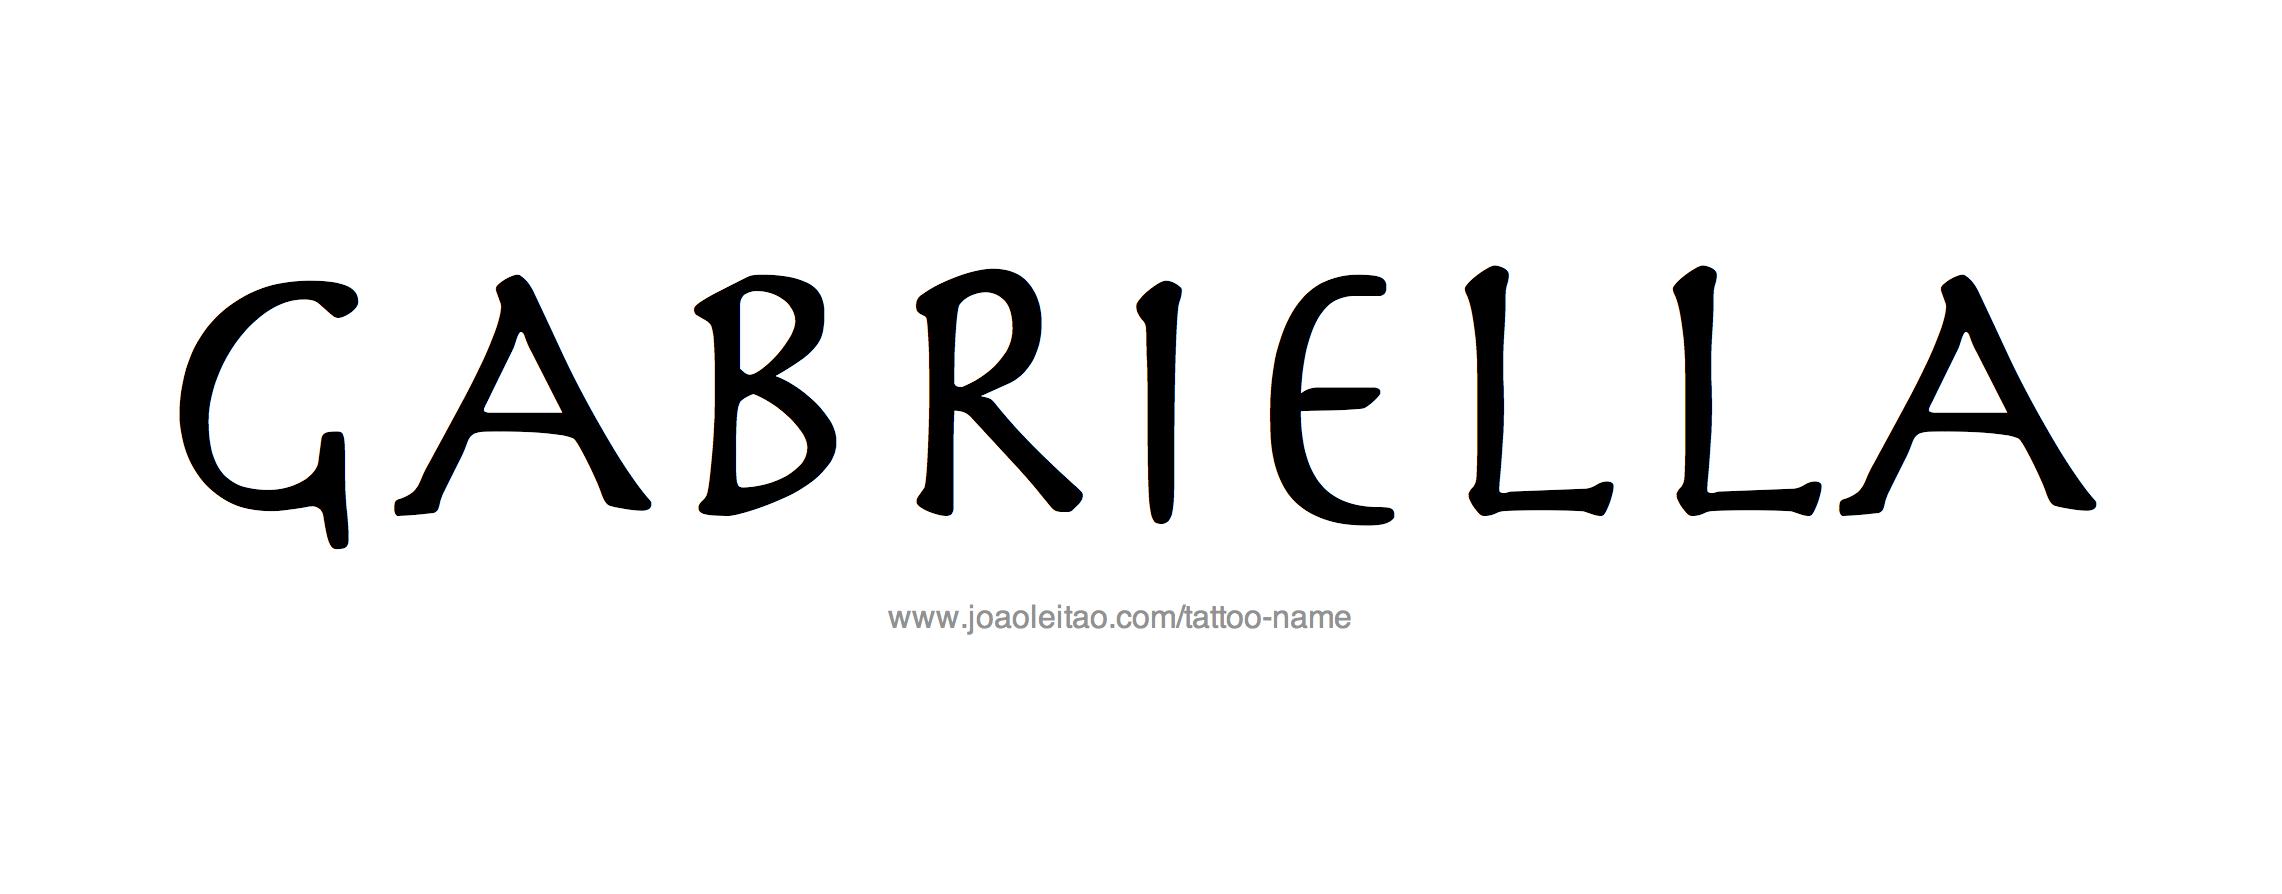 Name: Gabriella Name Tattoo Designs